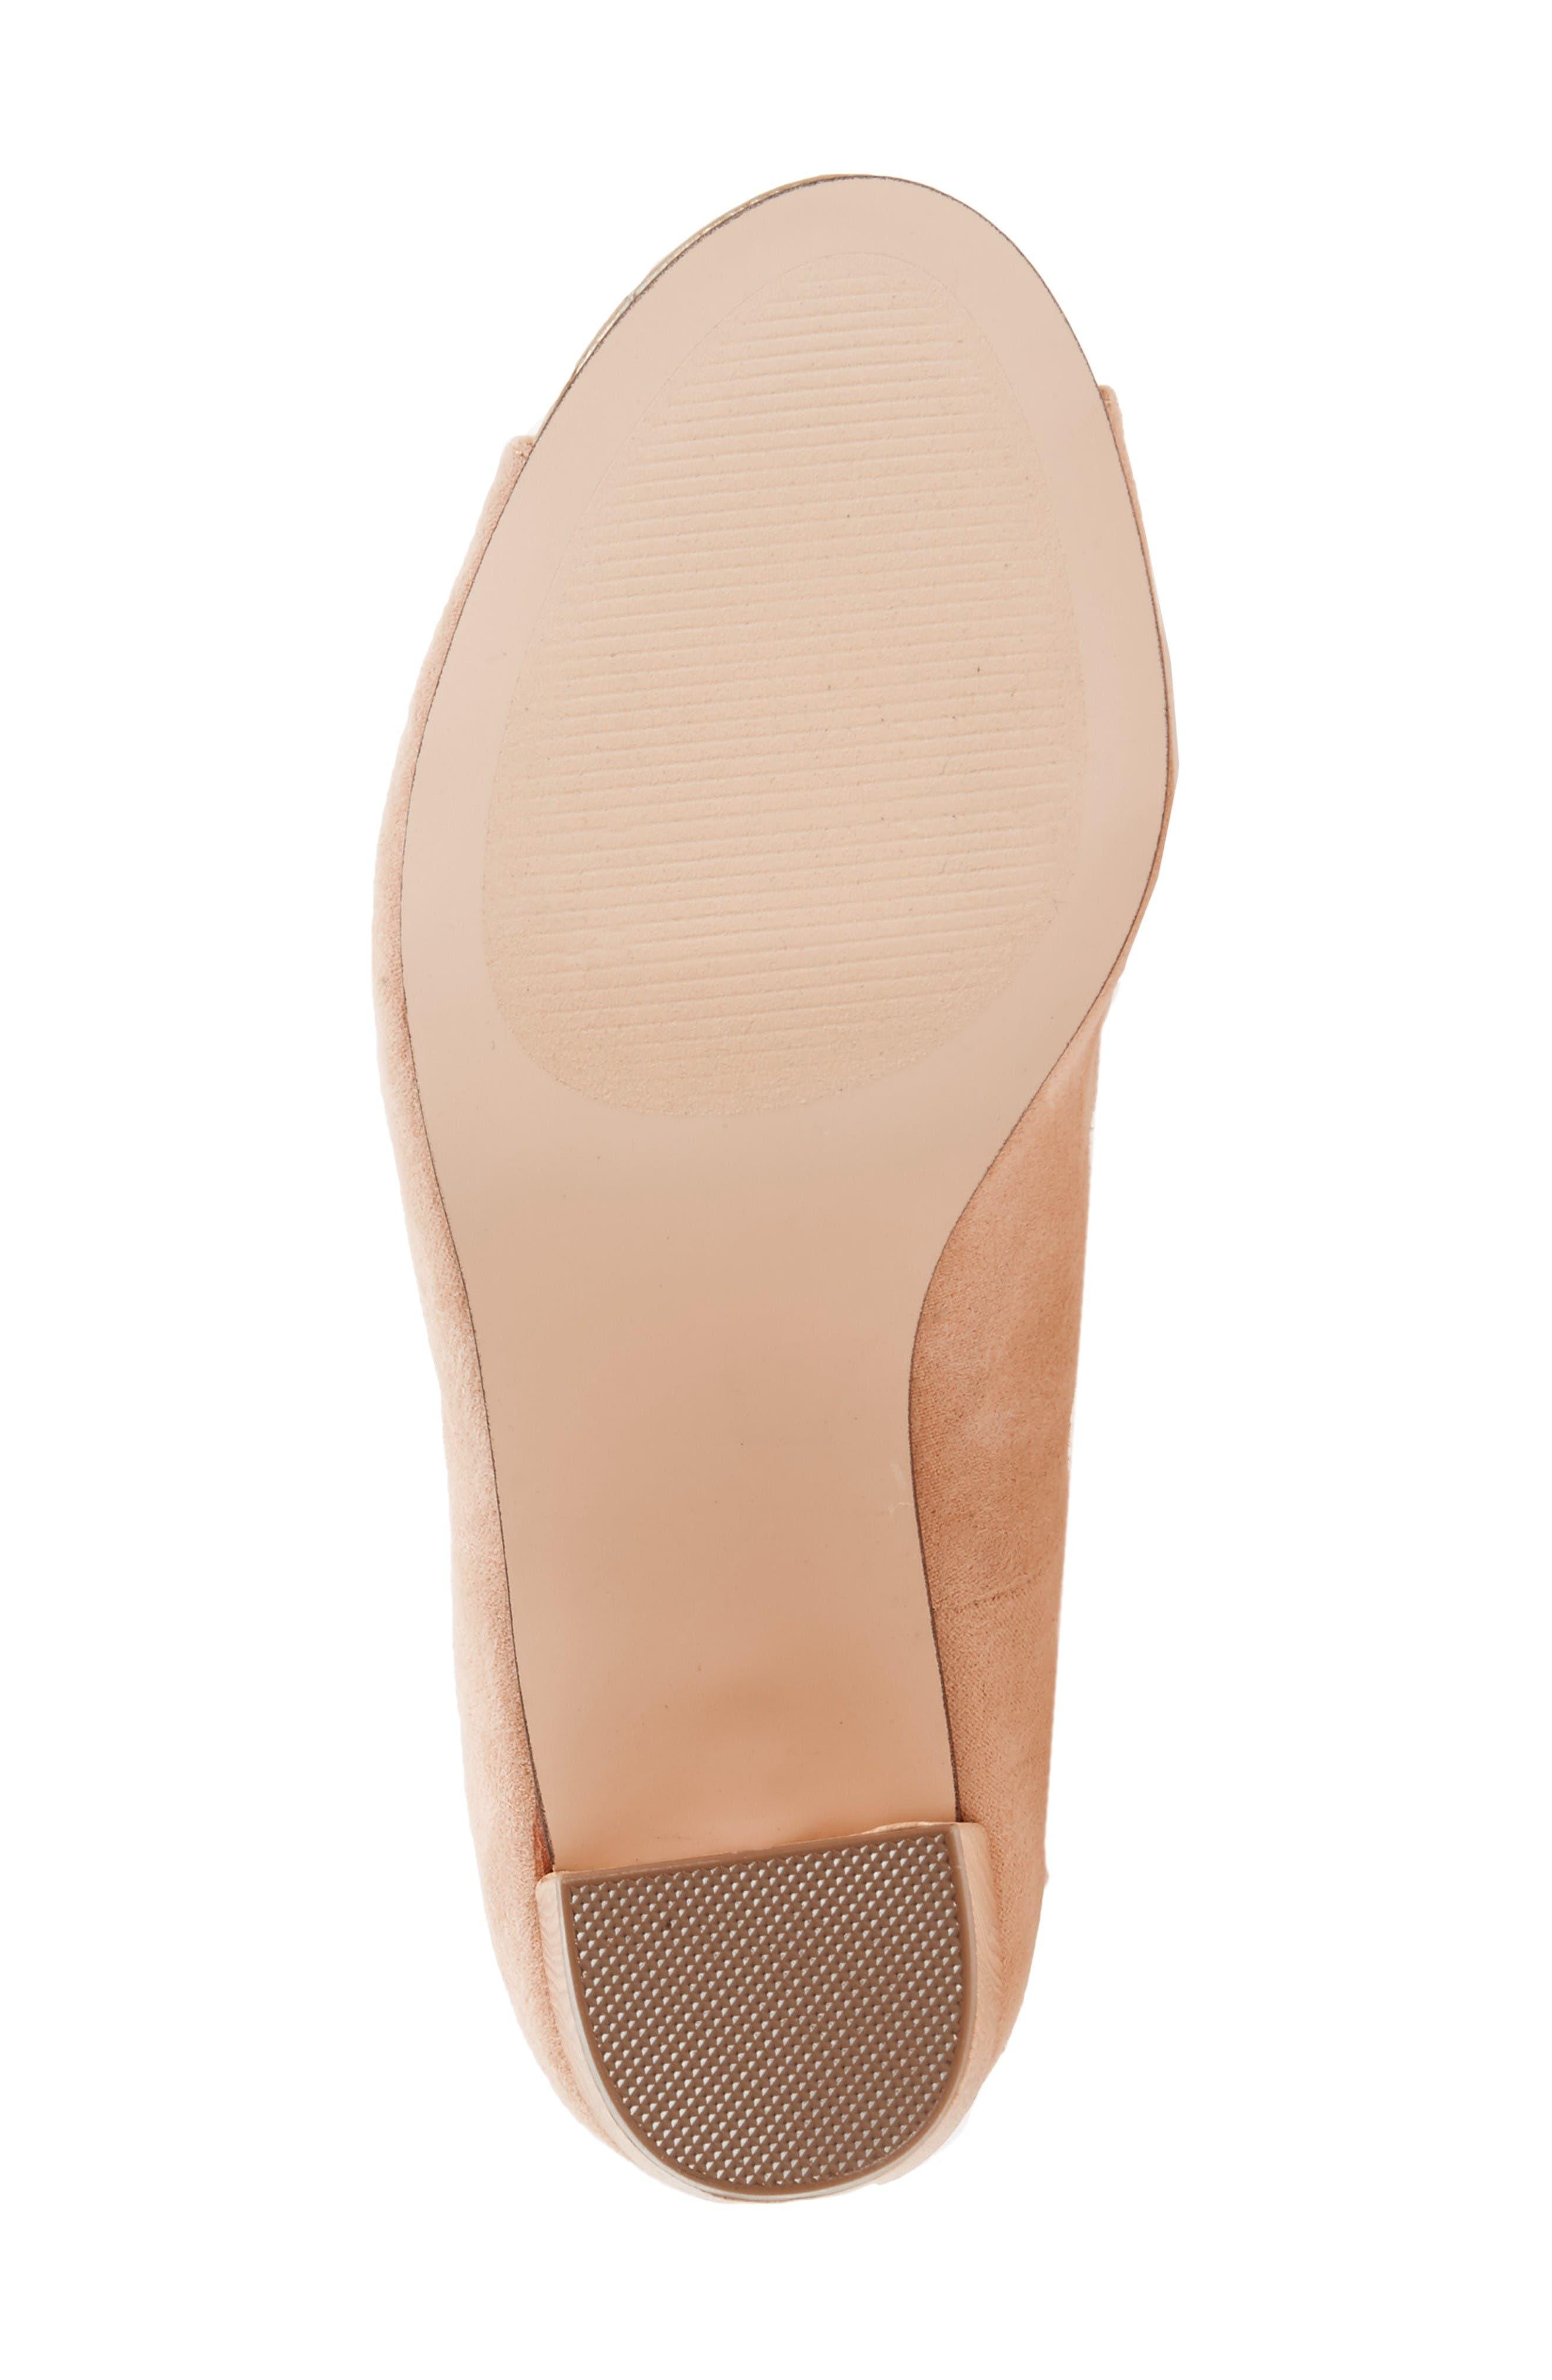 Vikki Block Heel Sandal,                             Alternate thumbnail 4, color,                             Nude Faux Suede